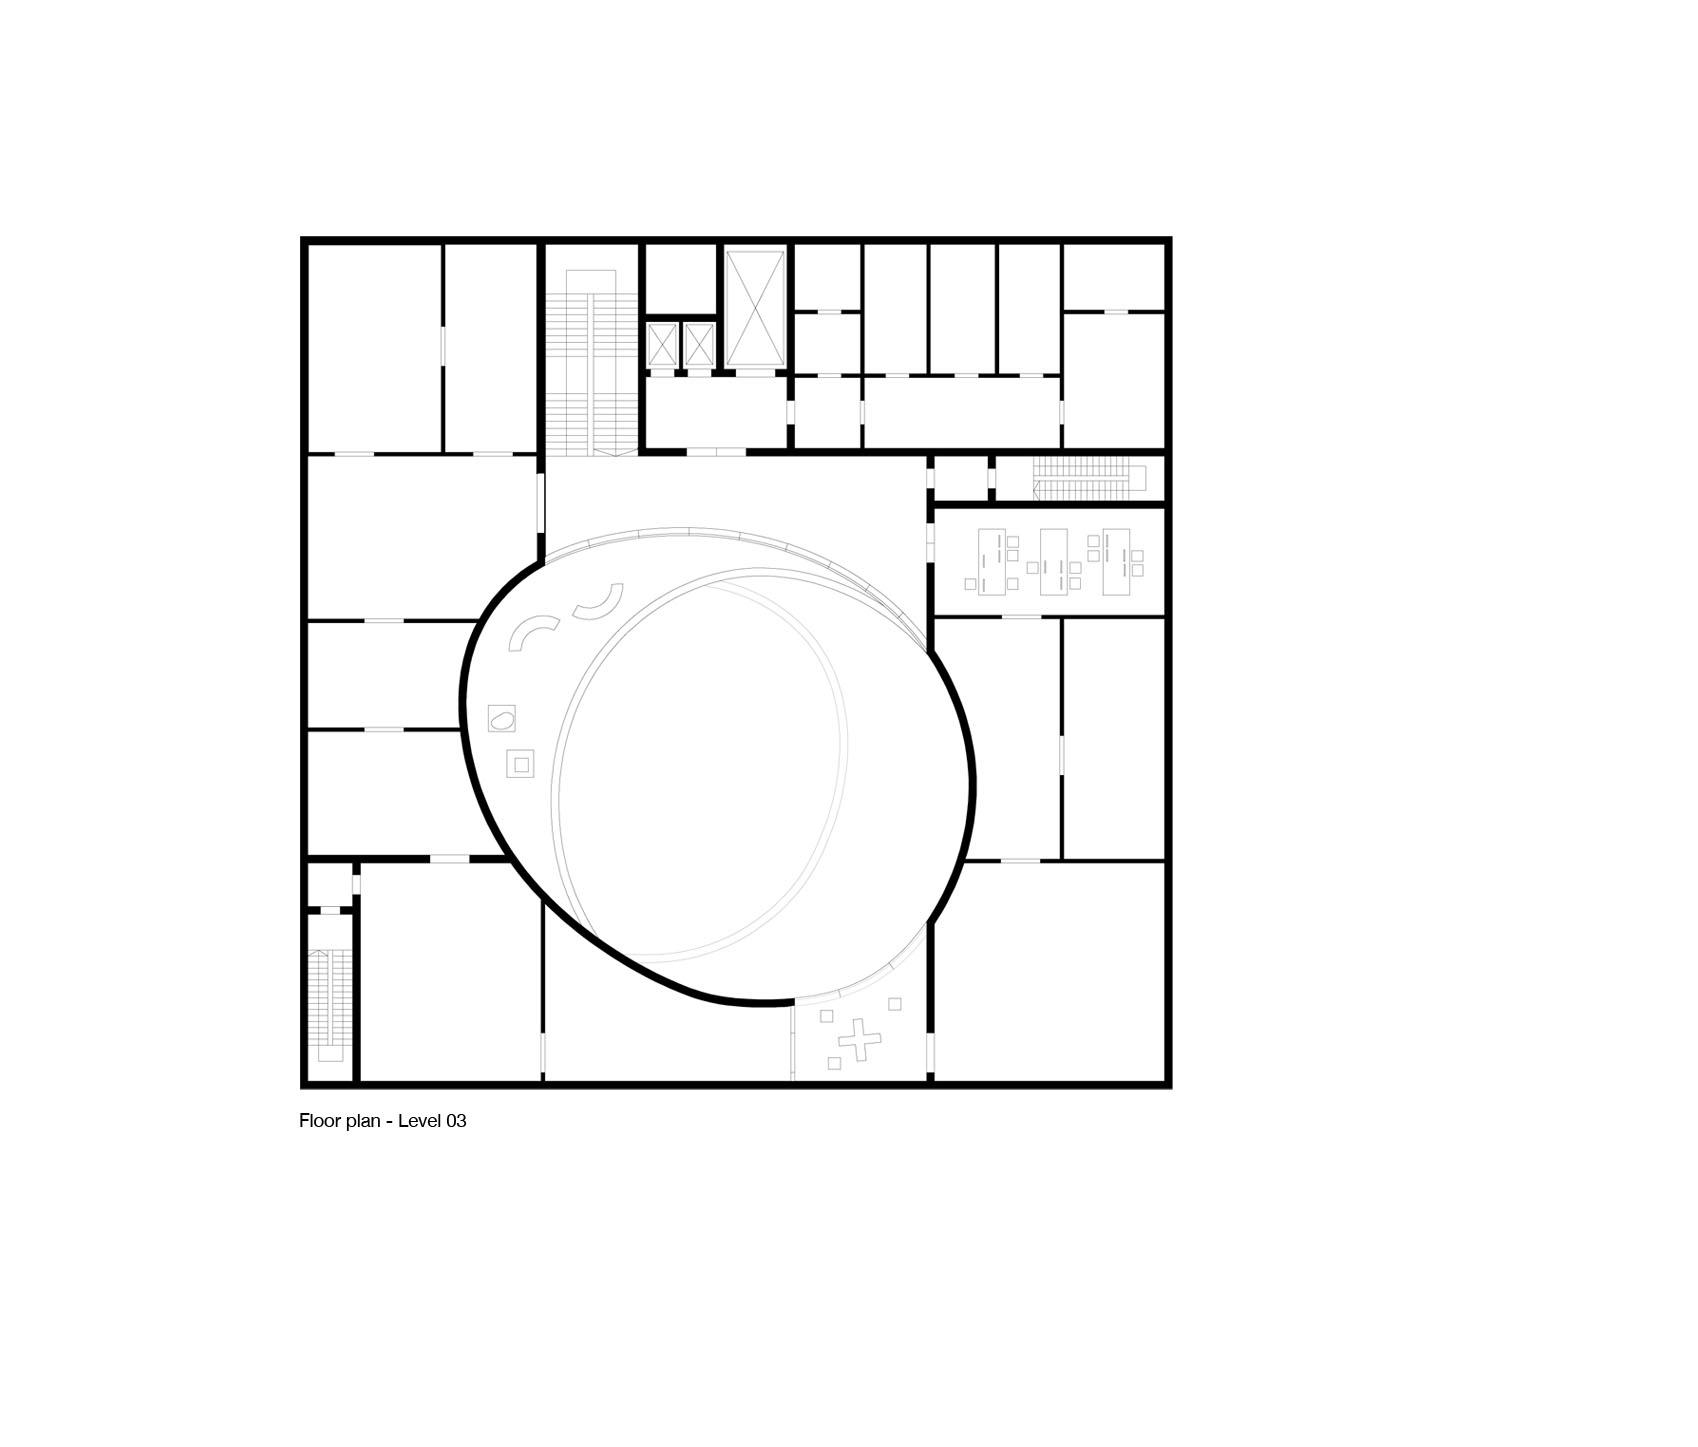 New Bauhaus Museum-Image 10.jpg